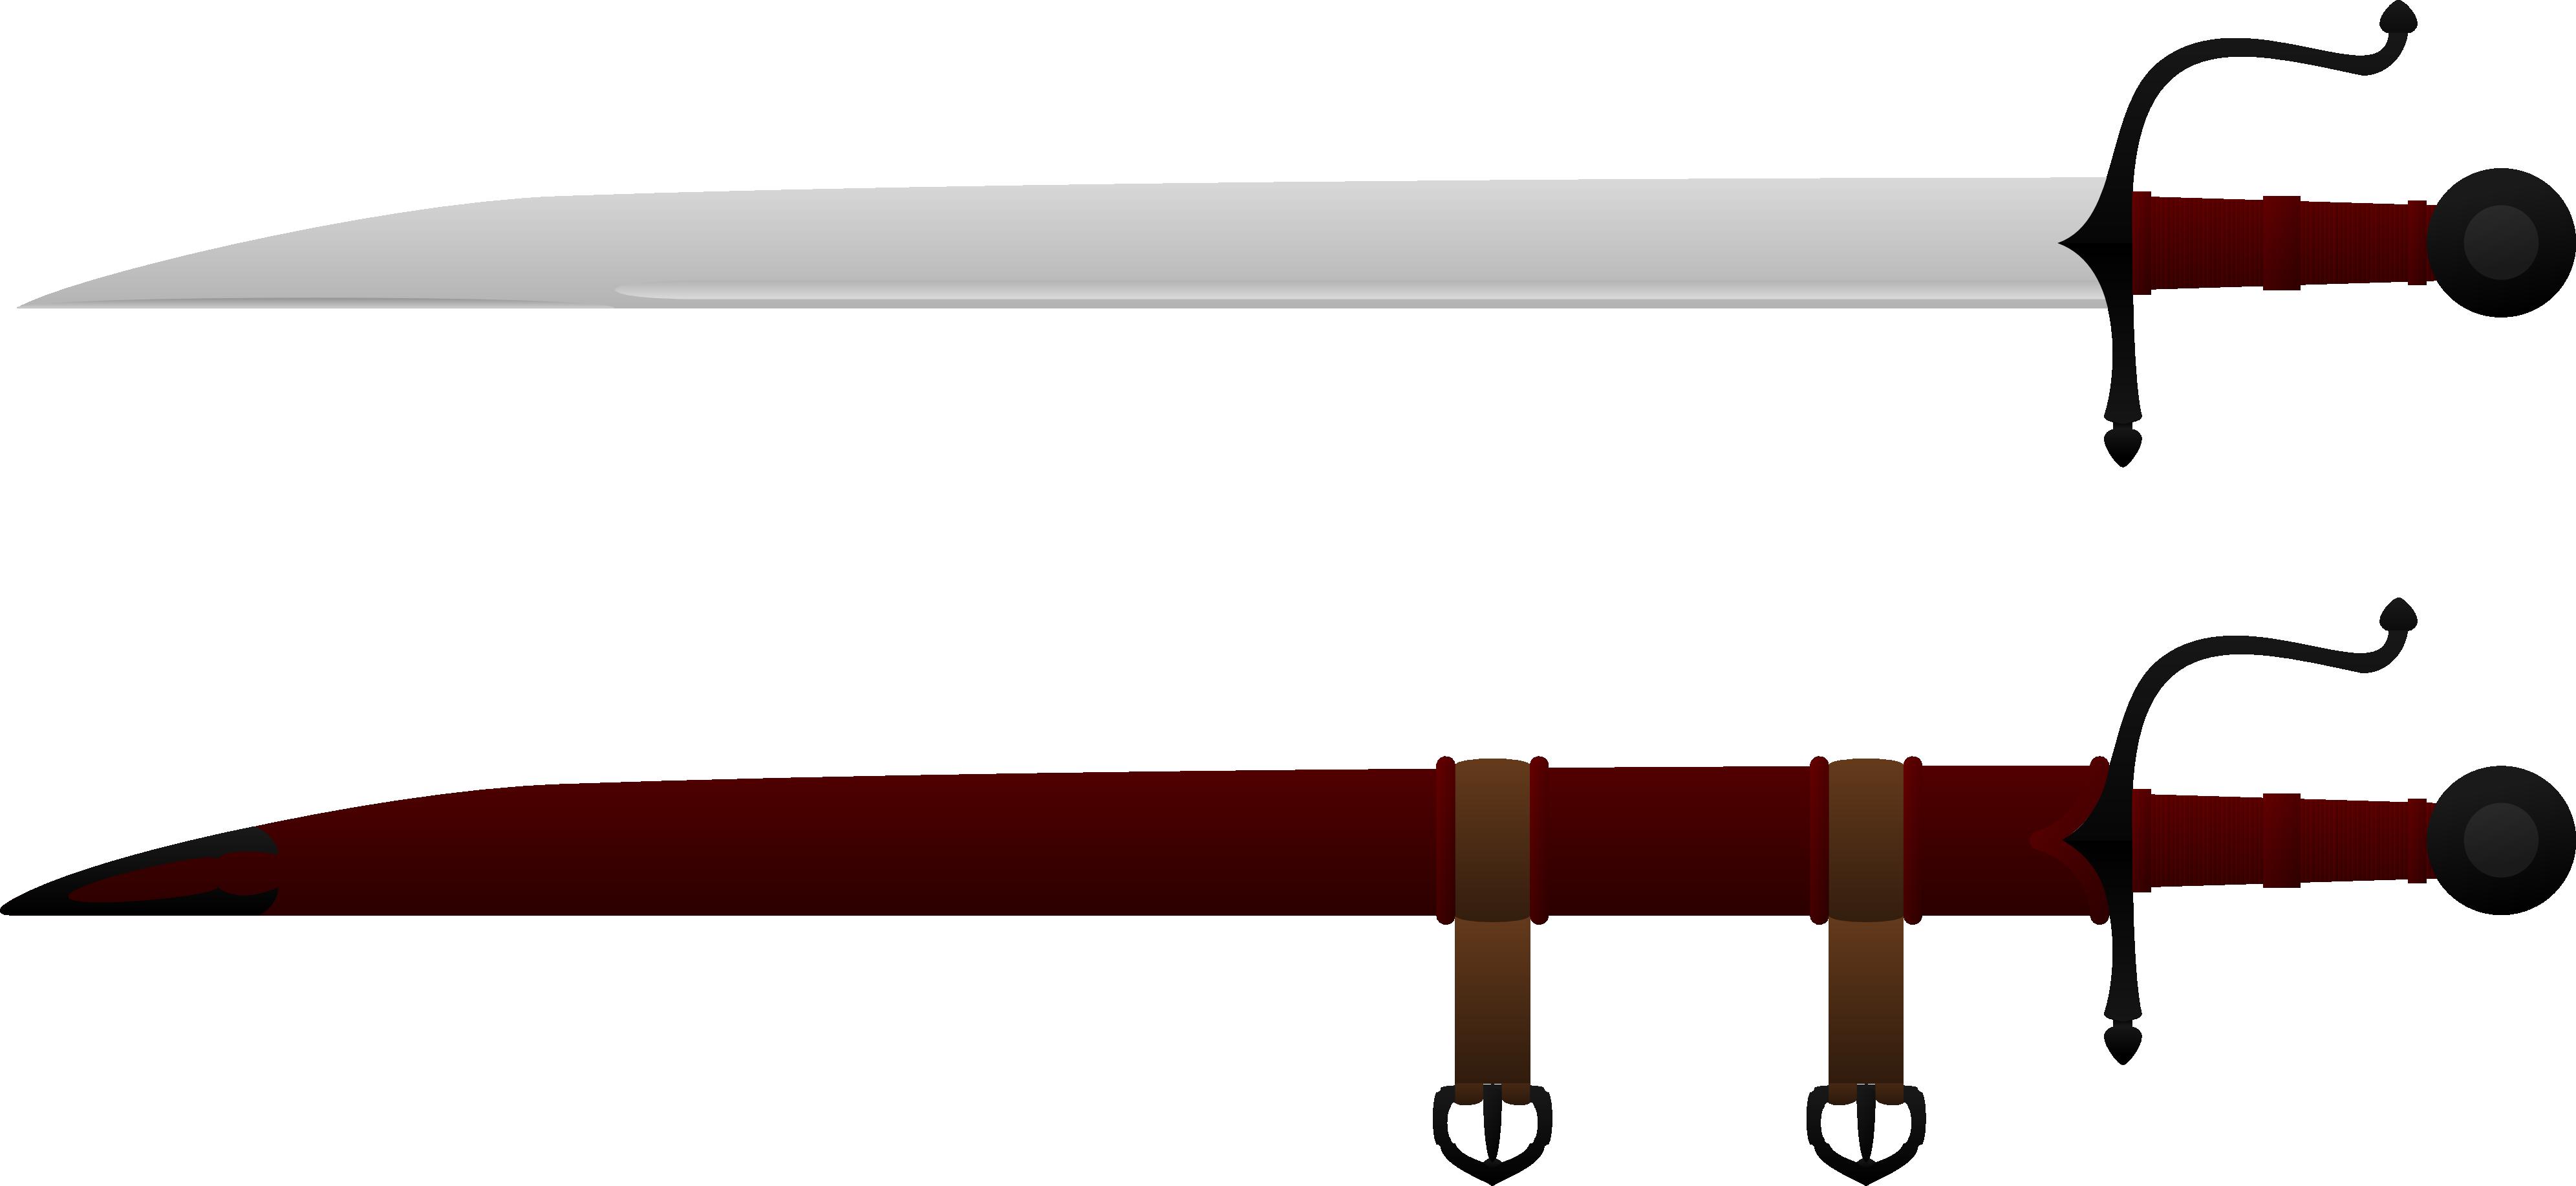 Clipart sword broadsword. Vincent s hall of